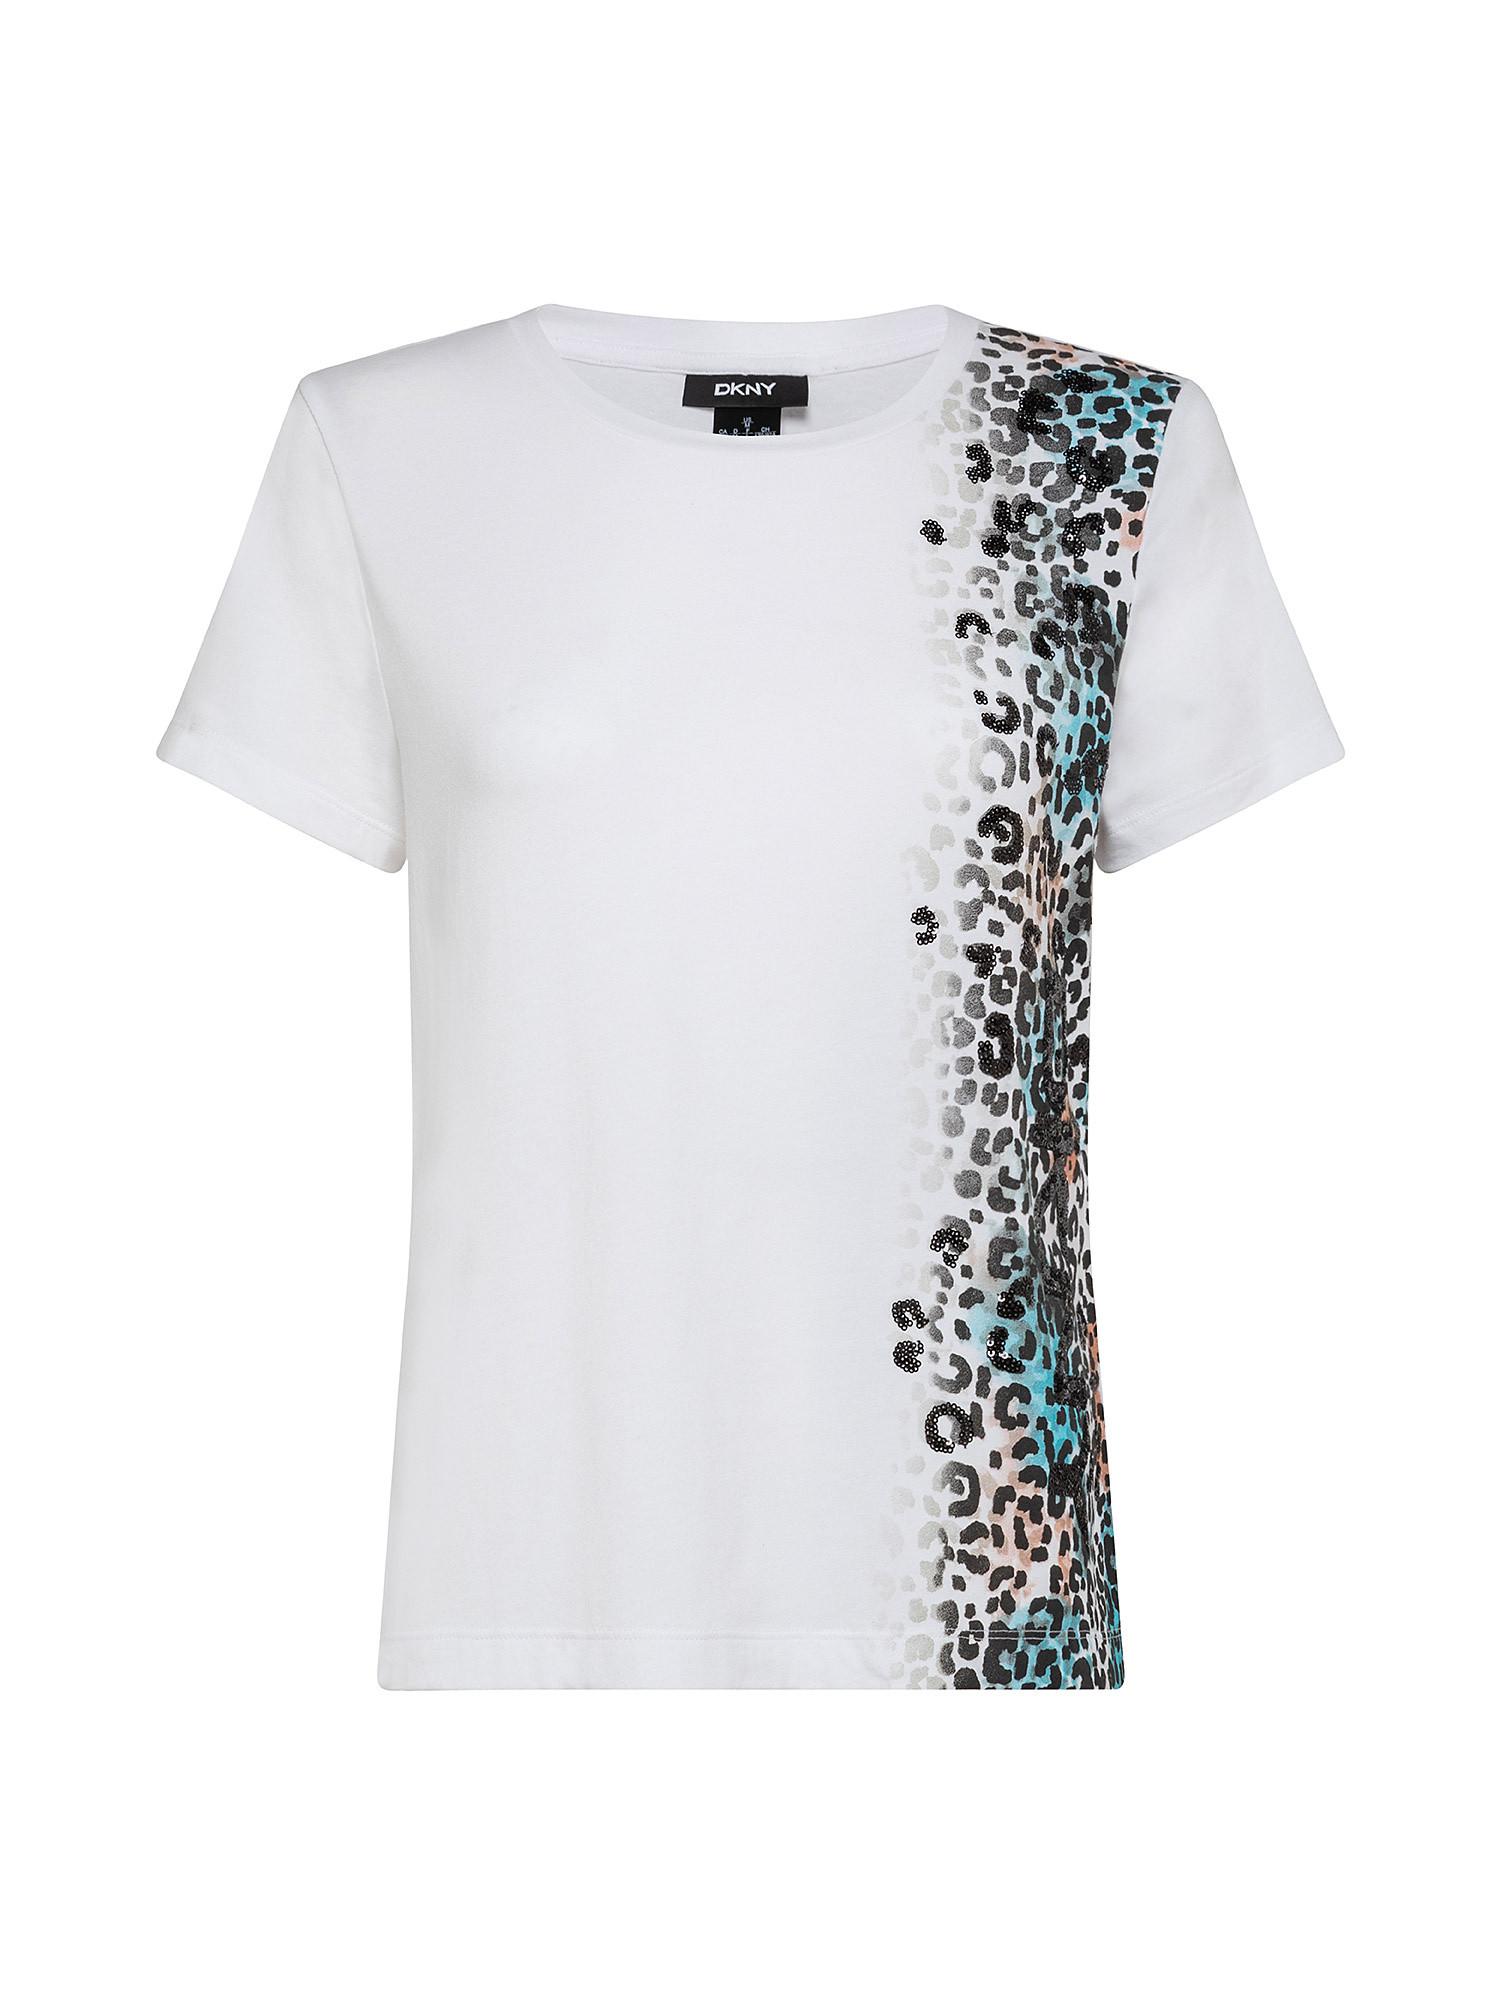 T-Shirt con logo leopardato, Bianco, large image number 0